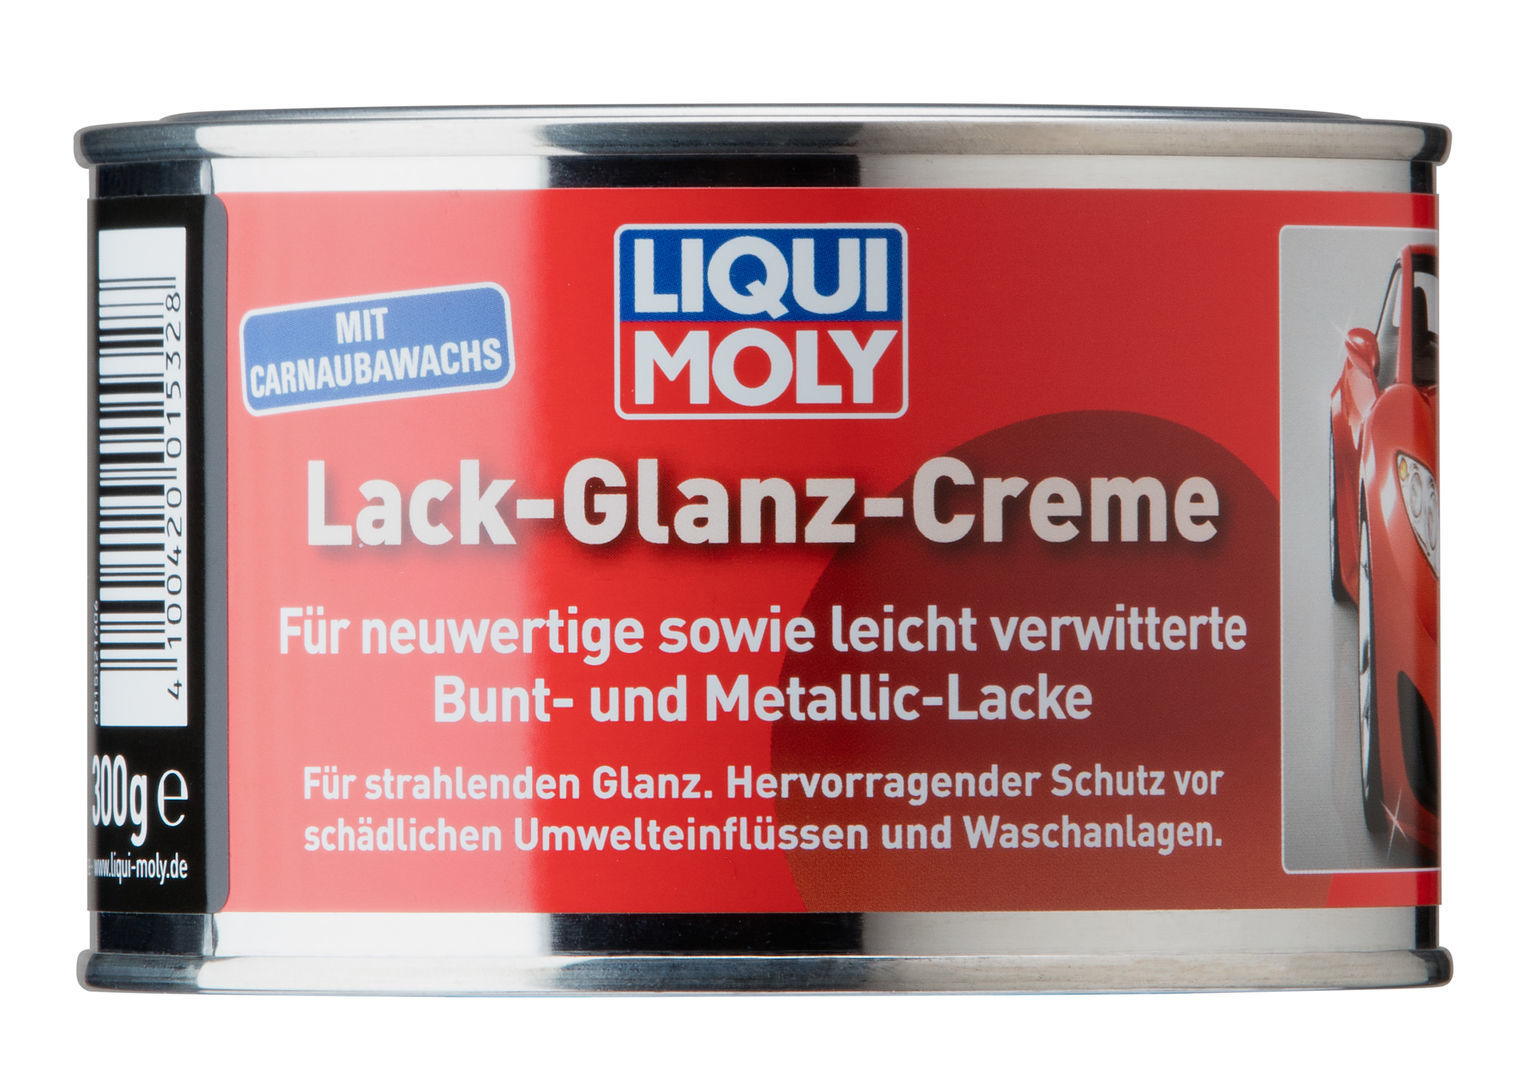 Liqui Moly Lack Glanz Creme